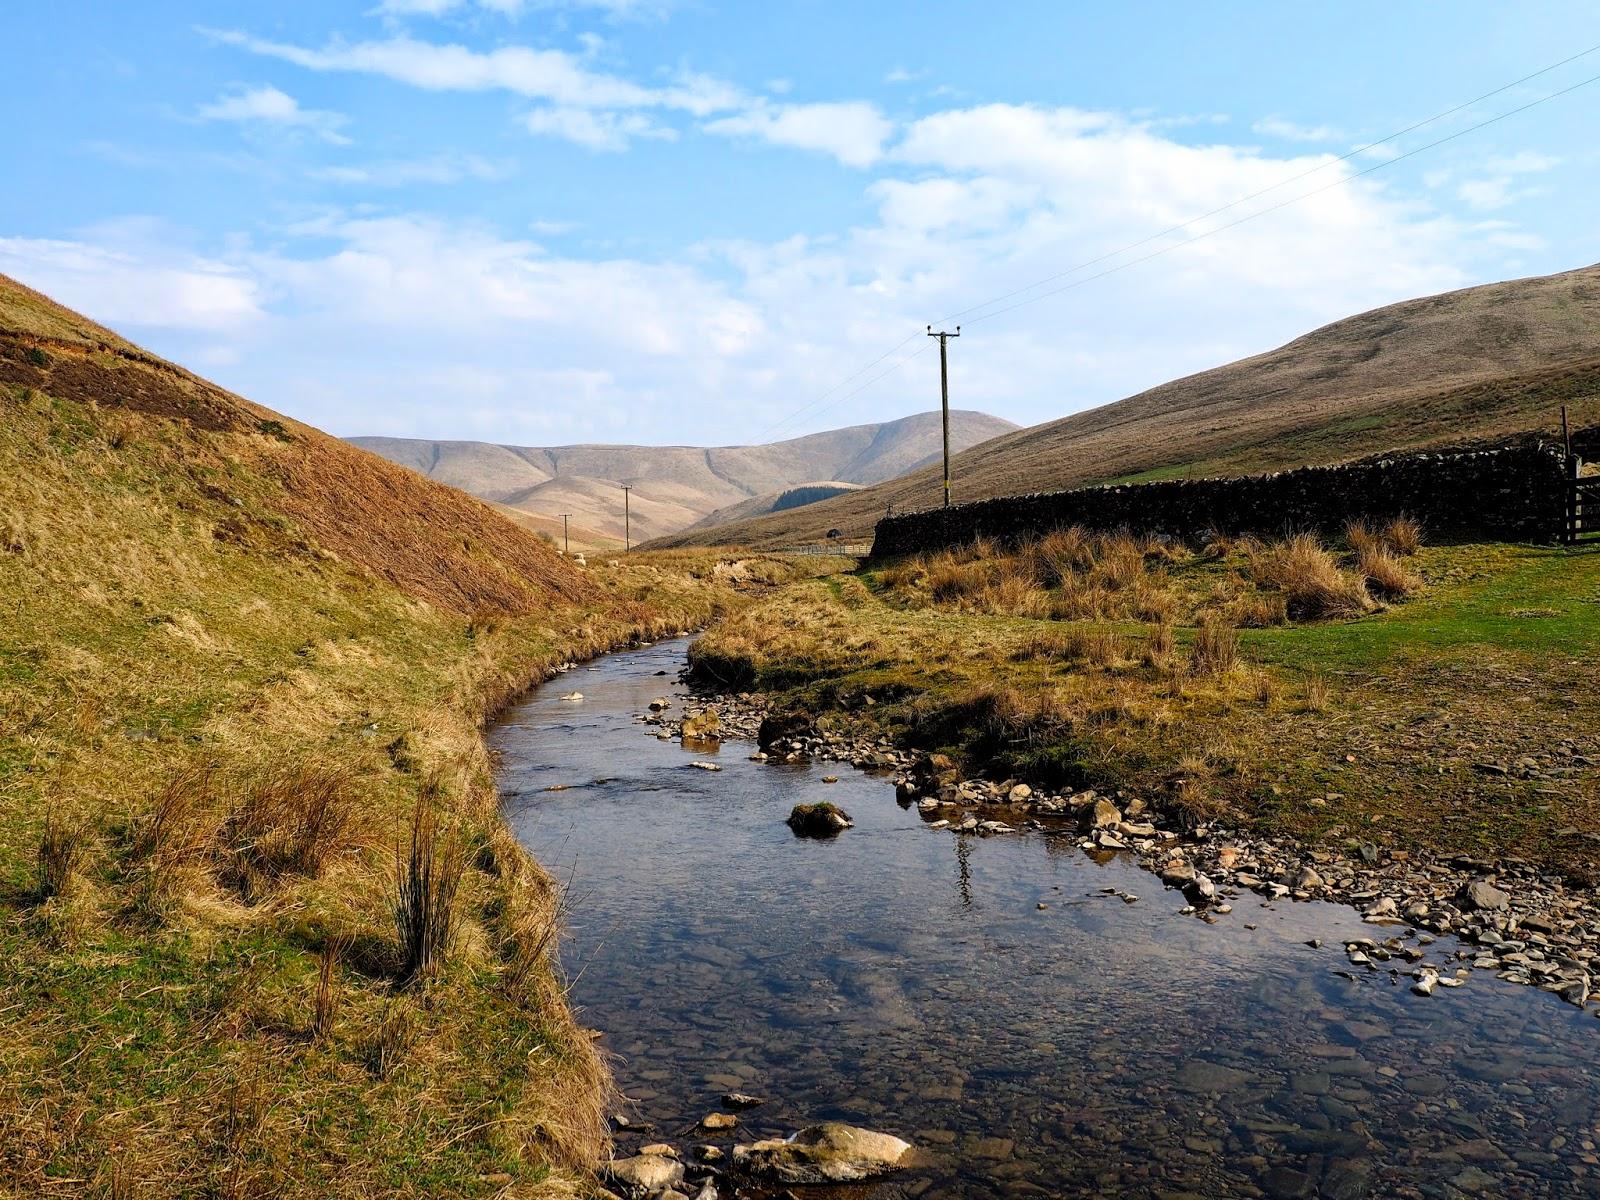 Countryside farm landscape in the Scottish Borders